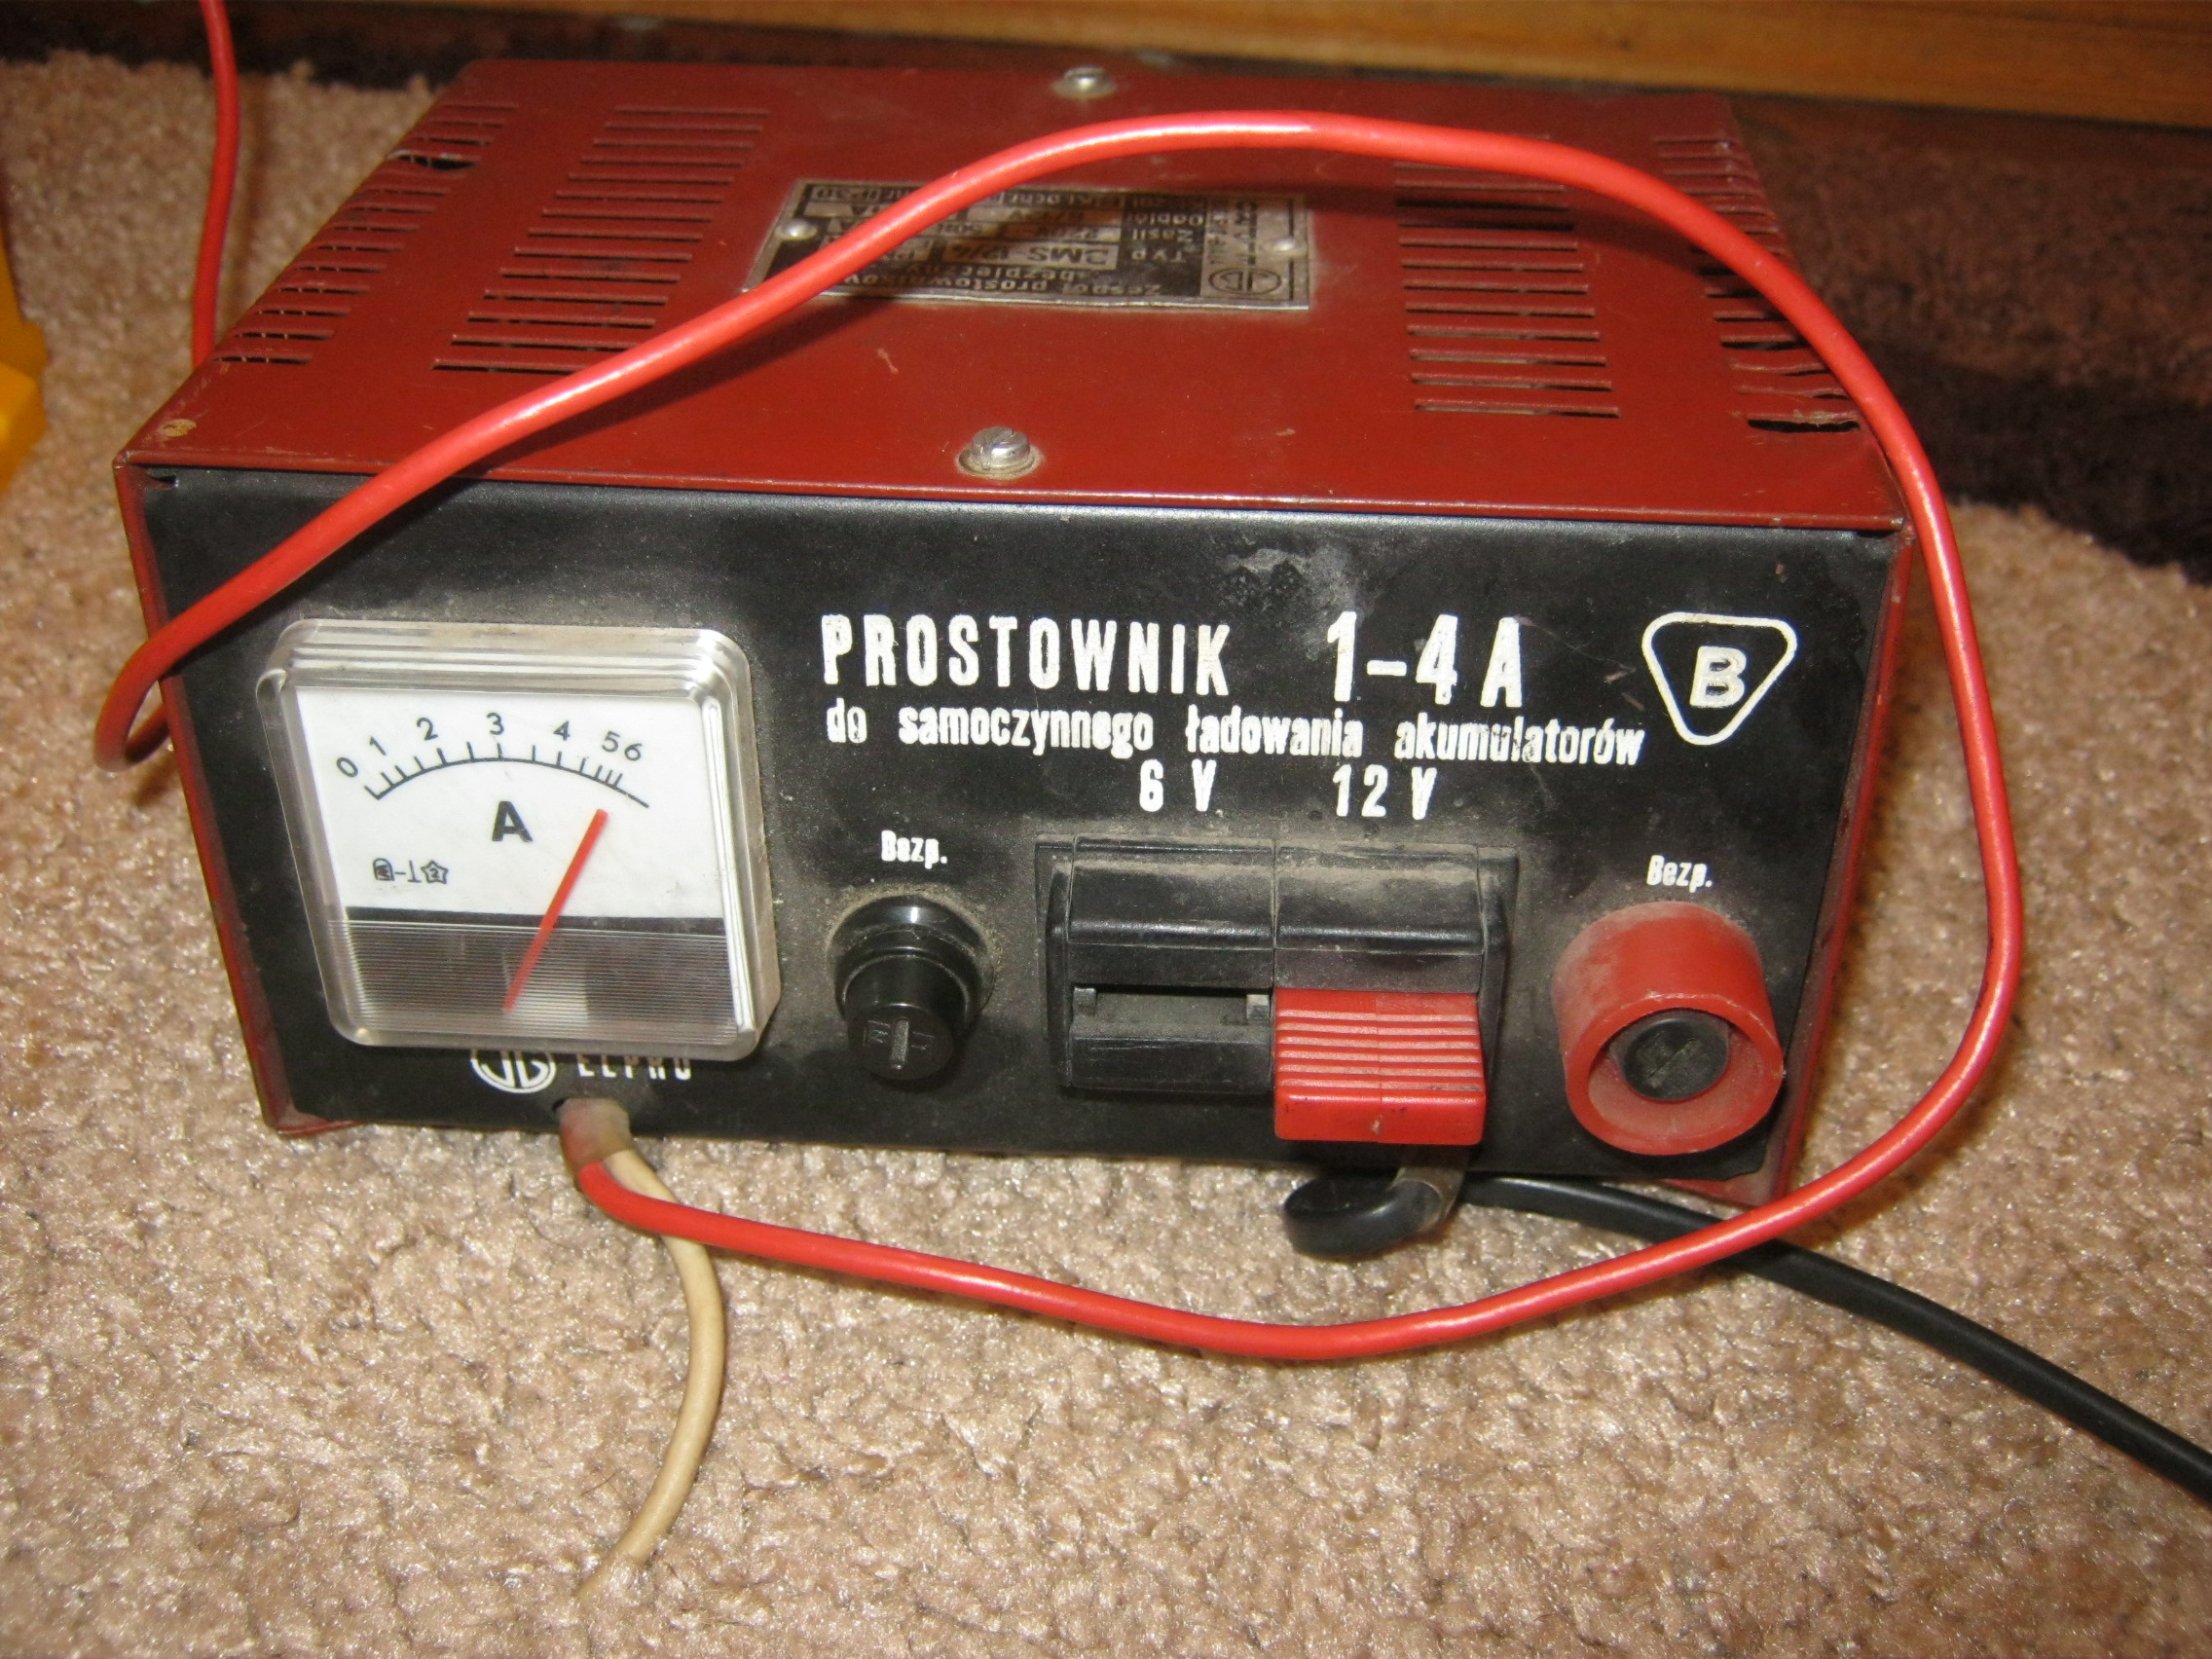 Czy akumulator 60Ah mo�na �adowa� prostownikiem 12V - 34-45Ah ?